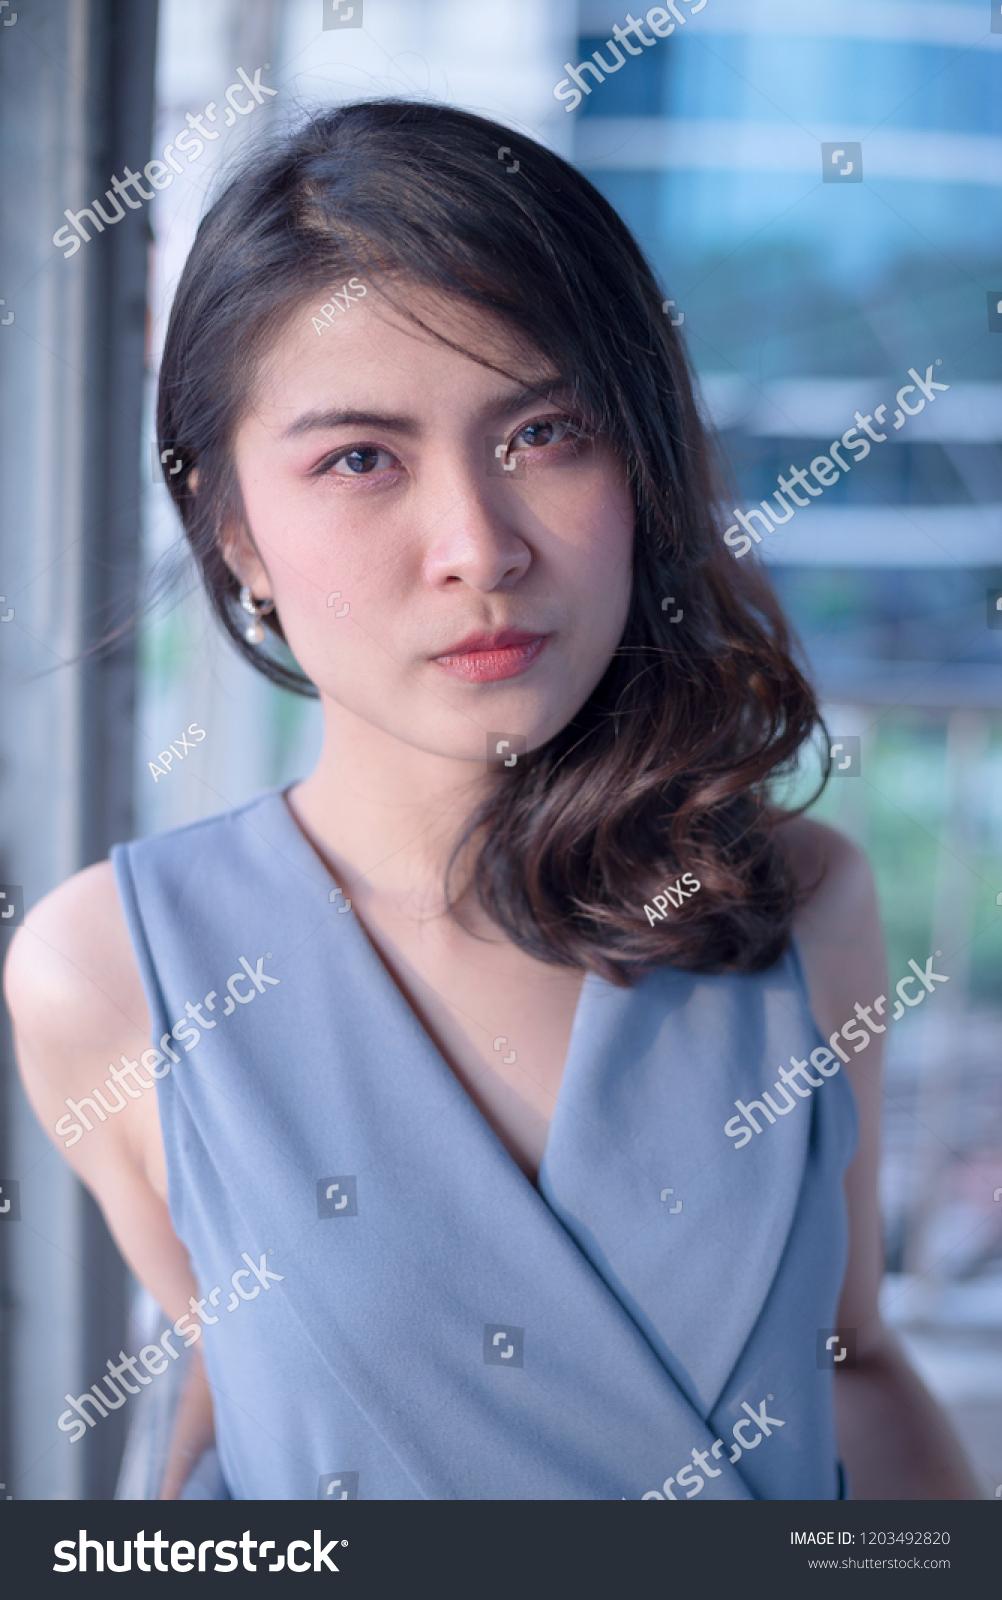 https://image.shutterstock.com/z/stock-photo-beautiful-woman-pretty-girl-bangkok-thailand-1203492820.jpg